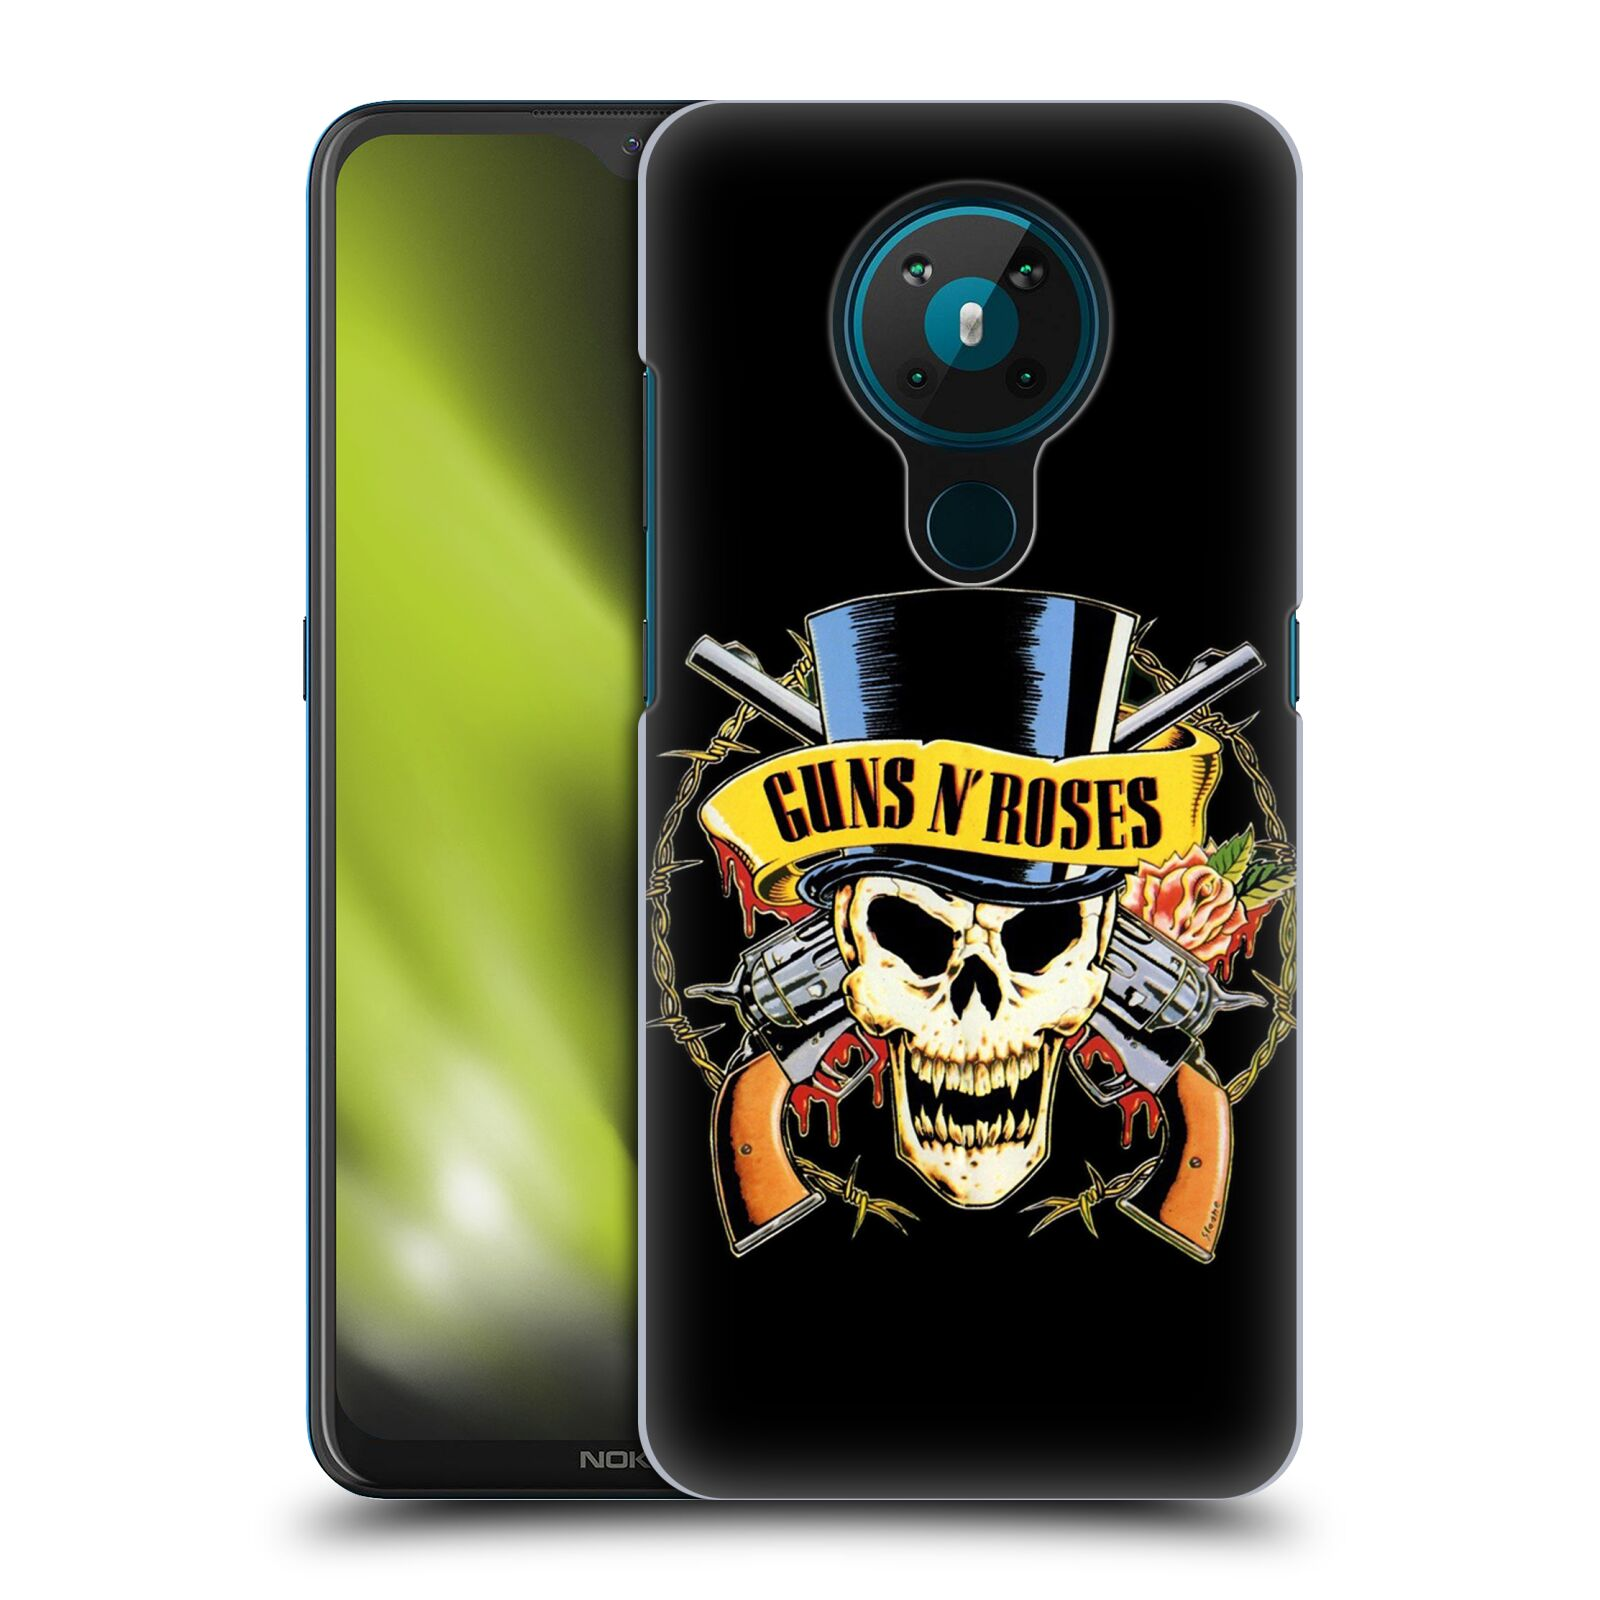 Plastové pouzdro na mobil Nokia 5.3 - Head Case - Guns N' Roses - Lebka